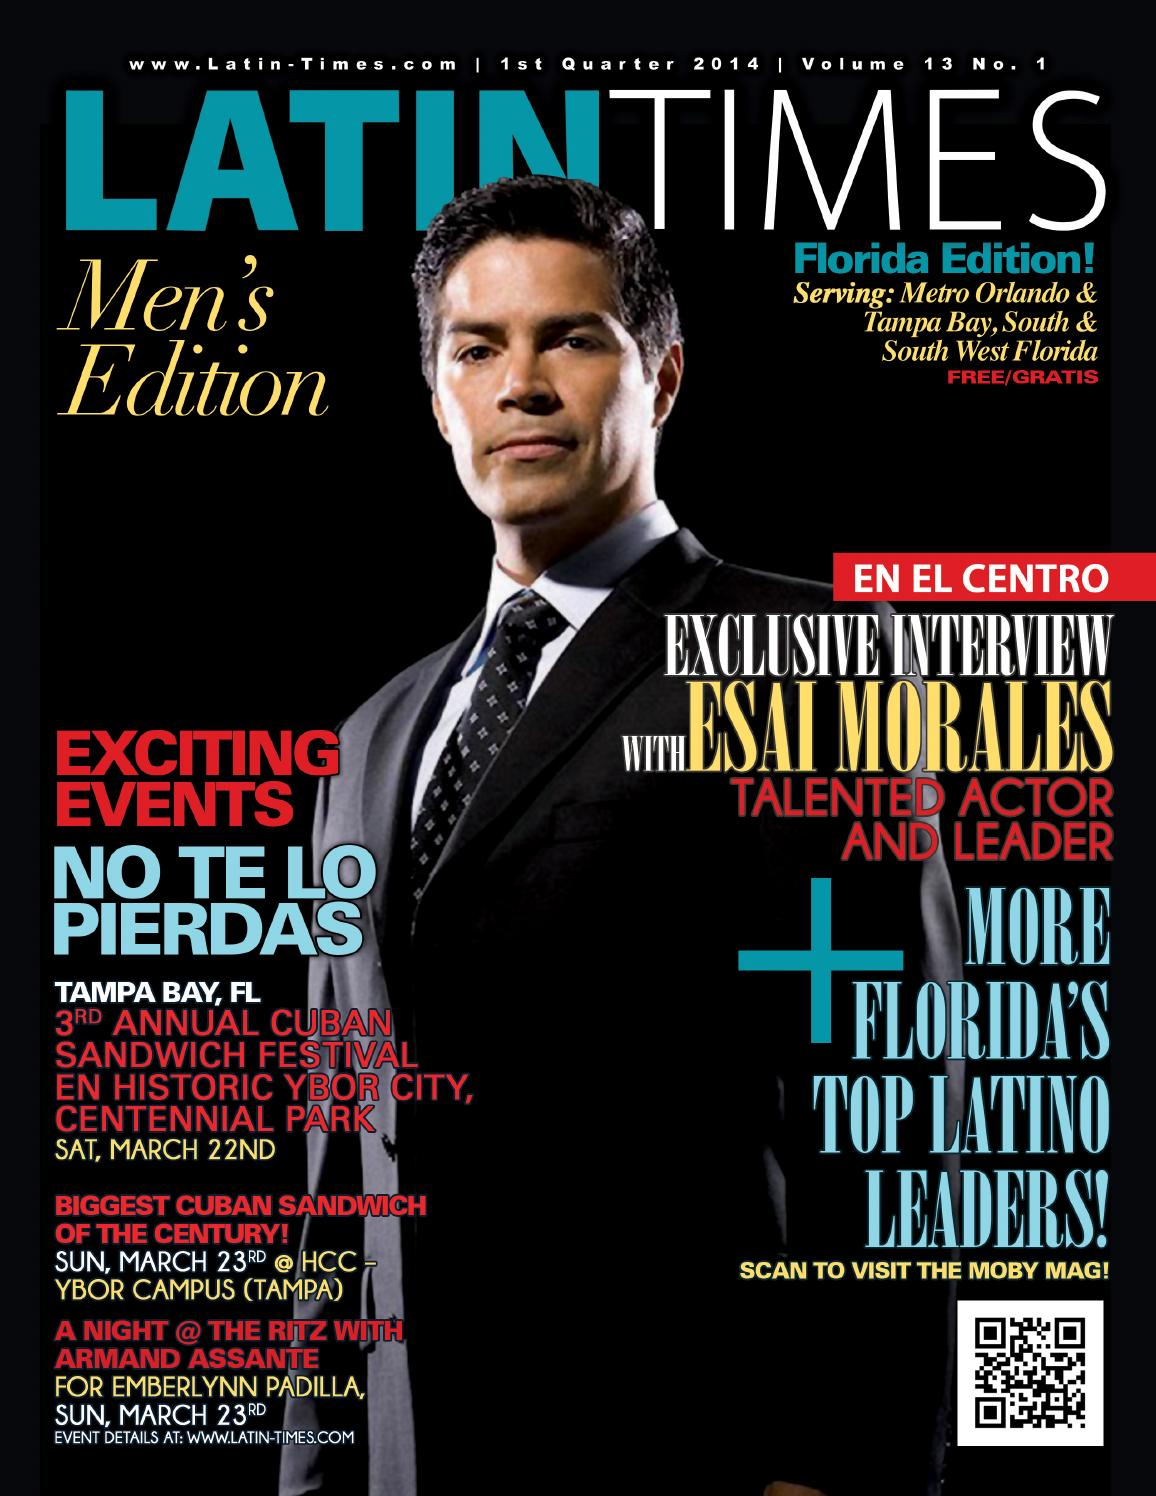 Latin times magazine volume 13 no 1 by Claribel Levinson - issuu